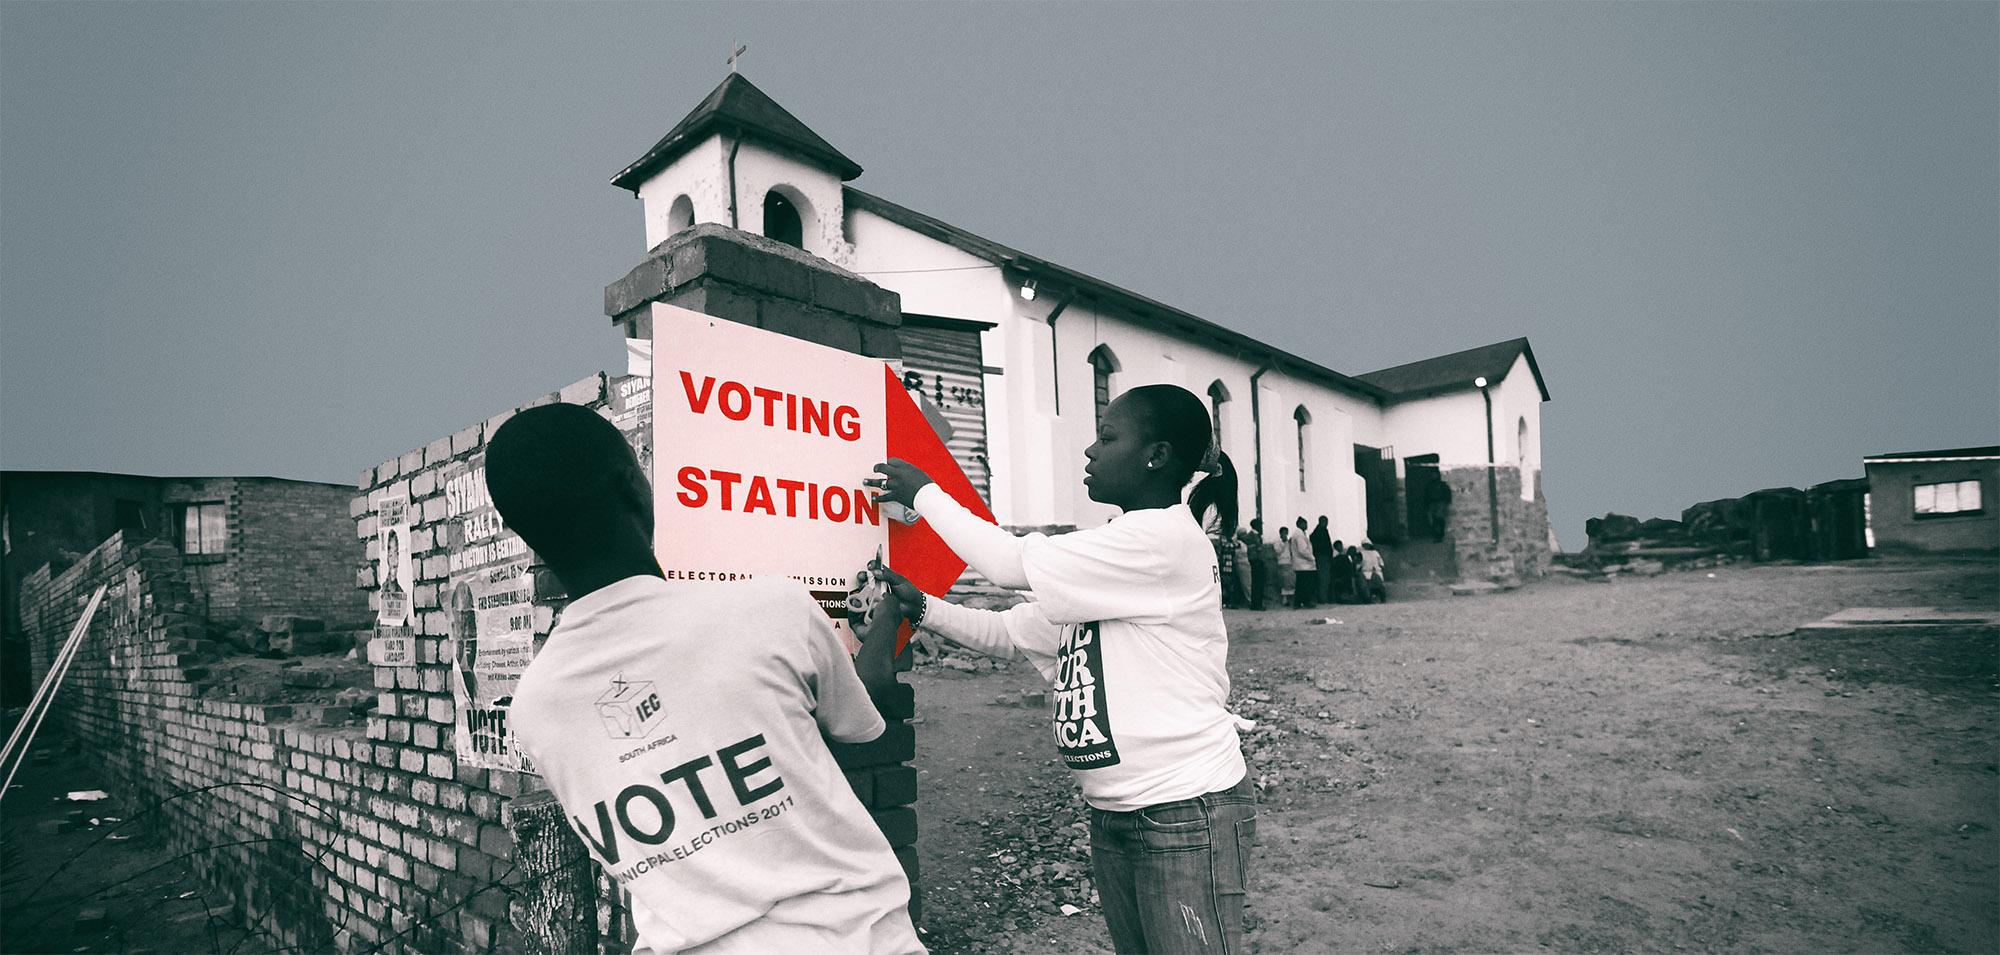 The 2021 municipal poll pushes on regardless of Covid-19, says IEC - Daily Maverick